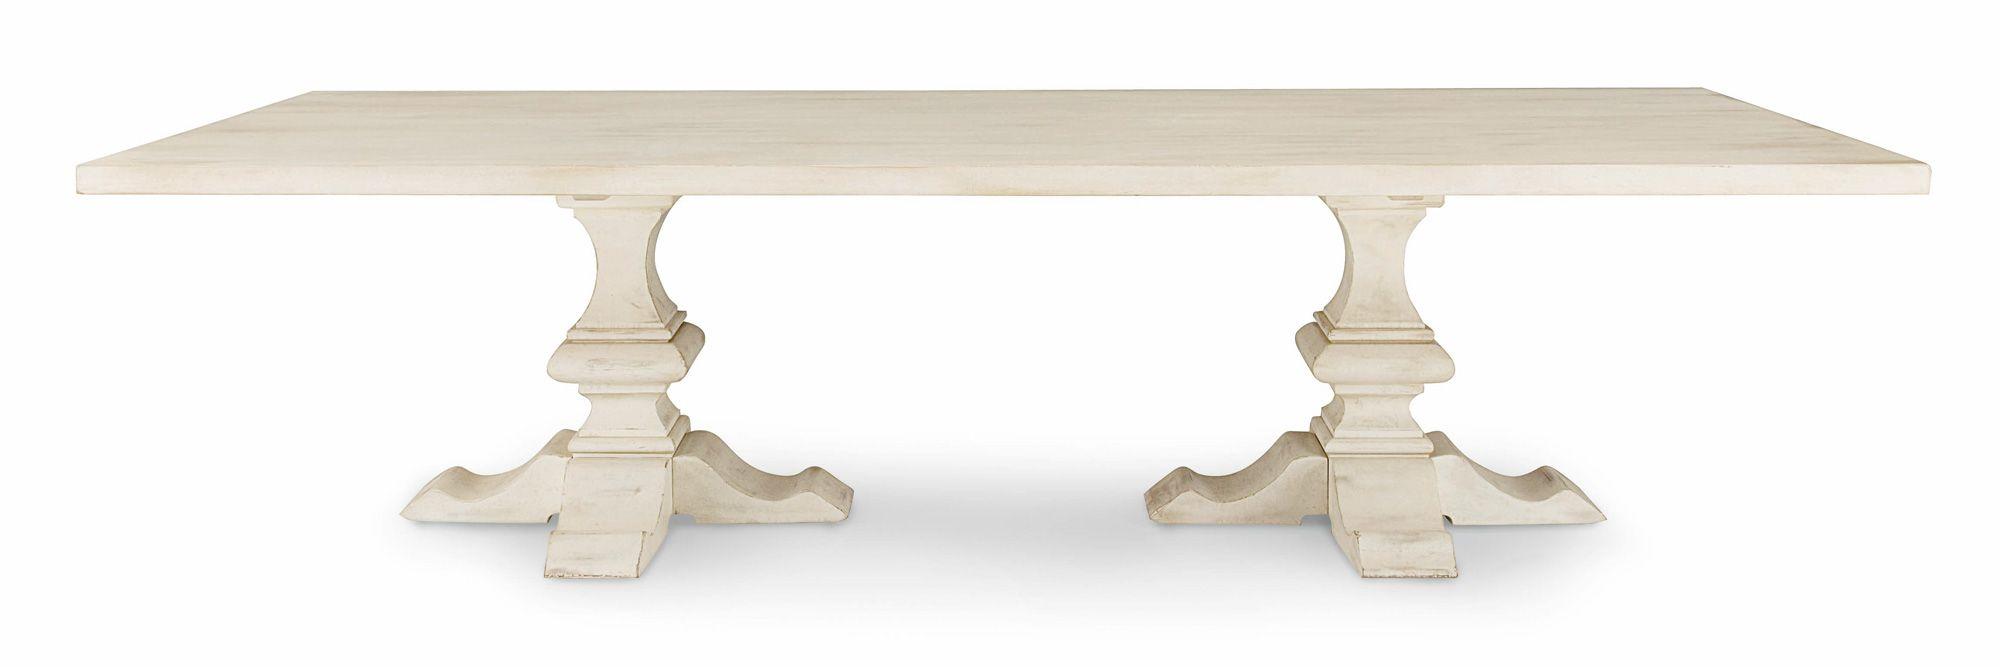 Bernhardt | Karlstad Dining Table (120 Inch) (340 243, 340